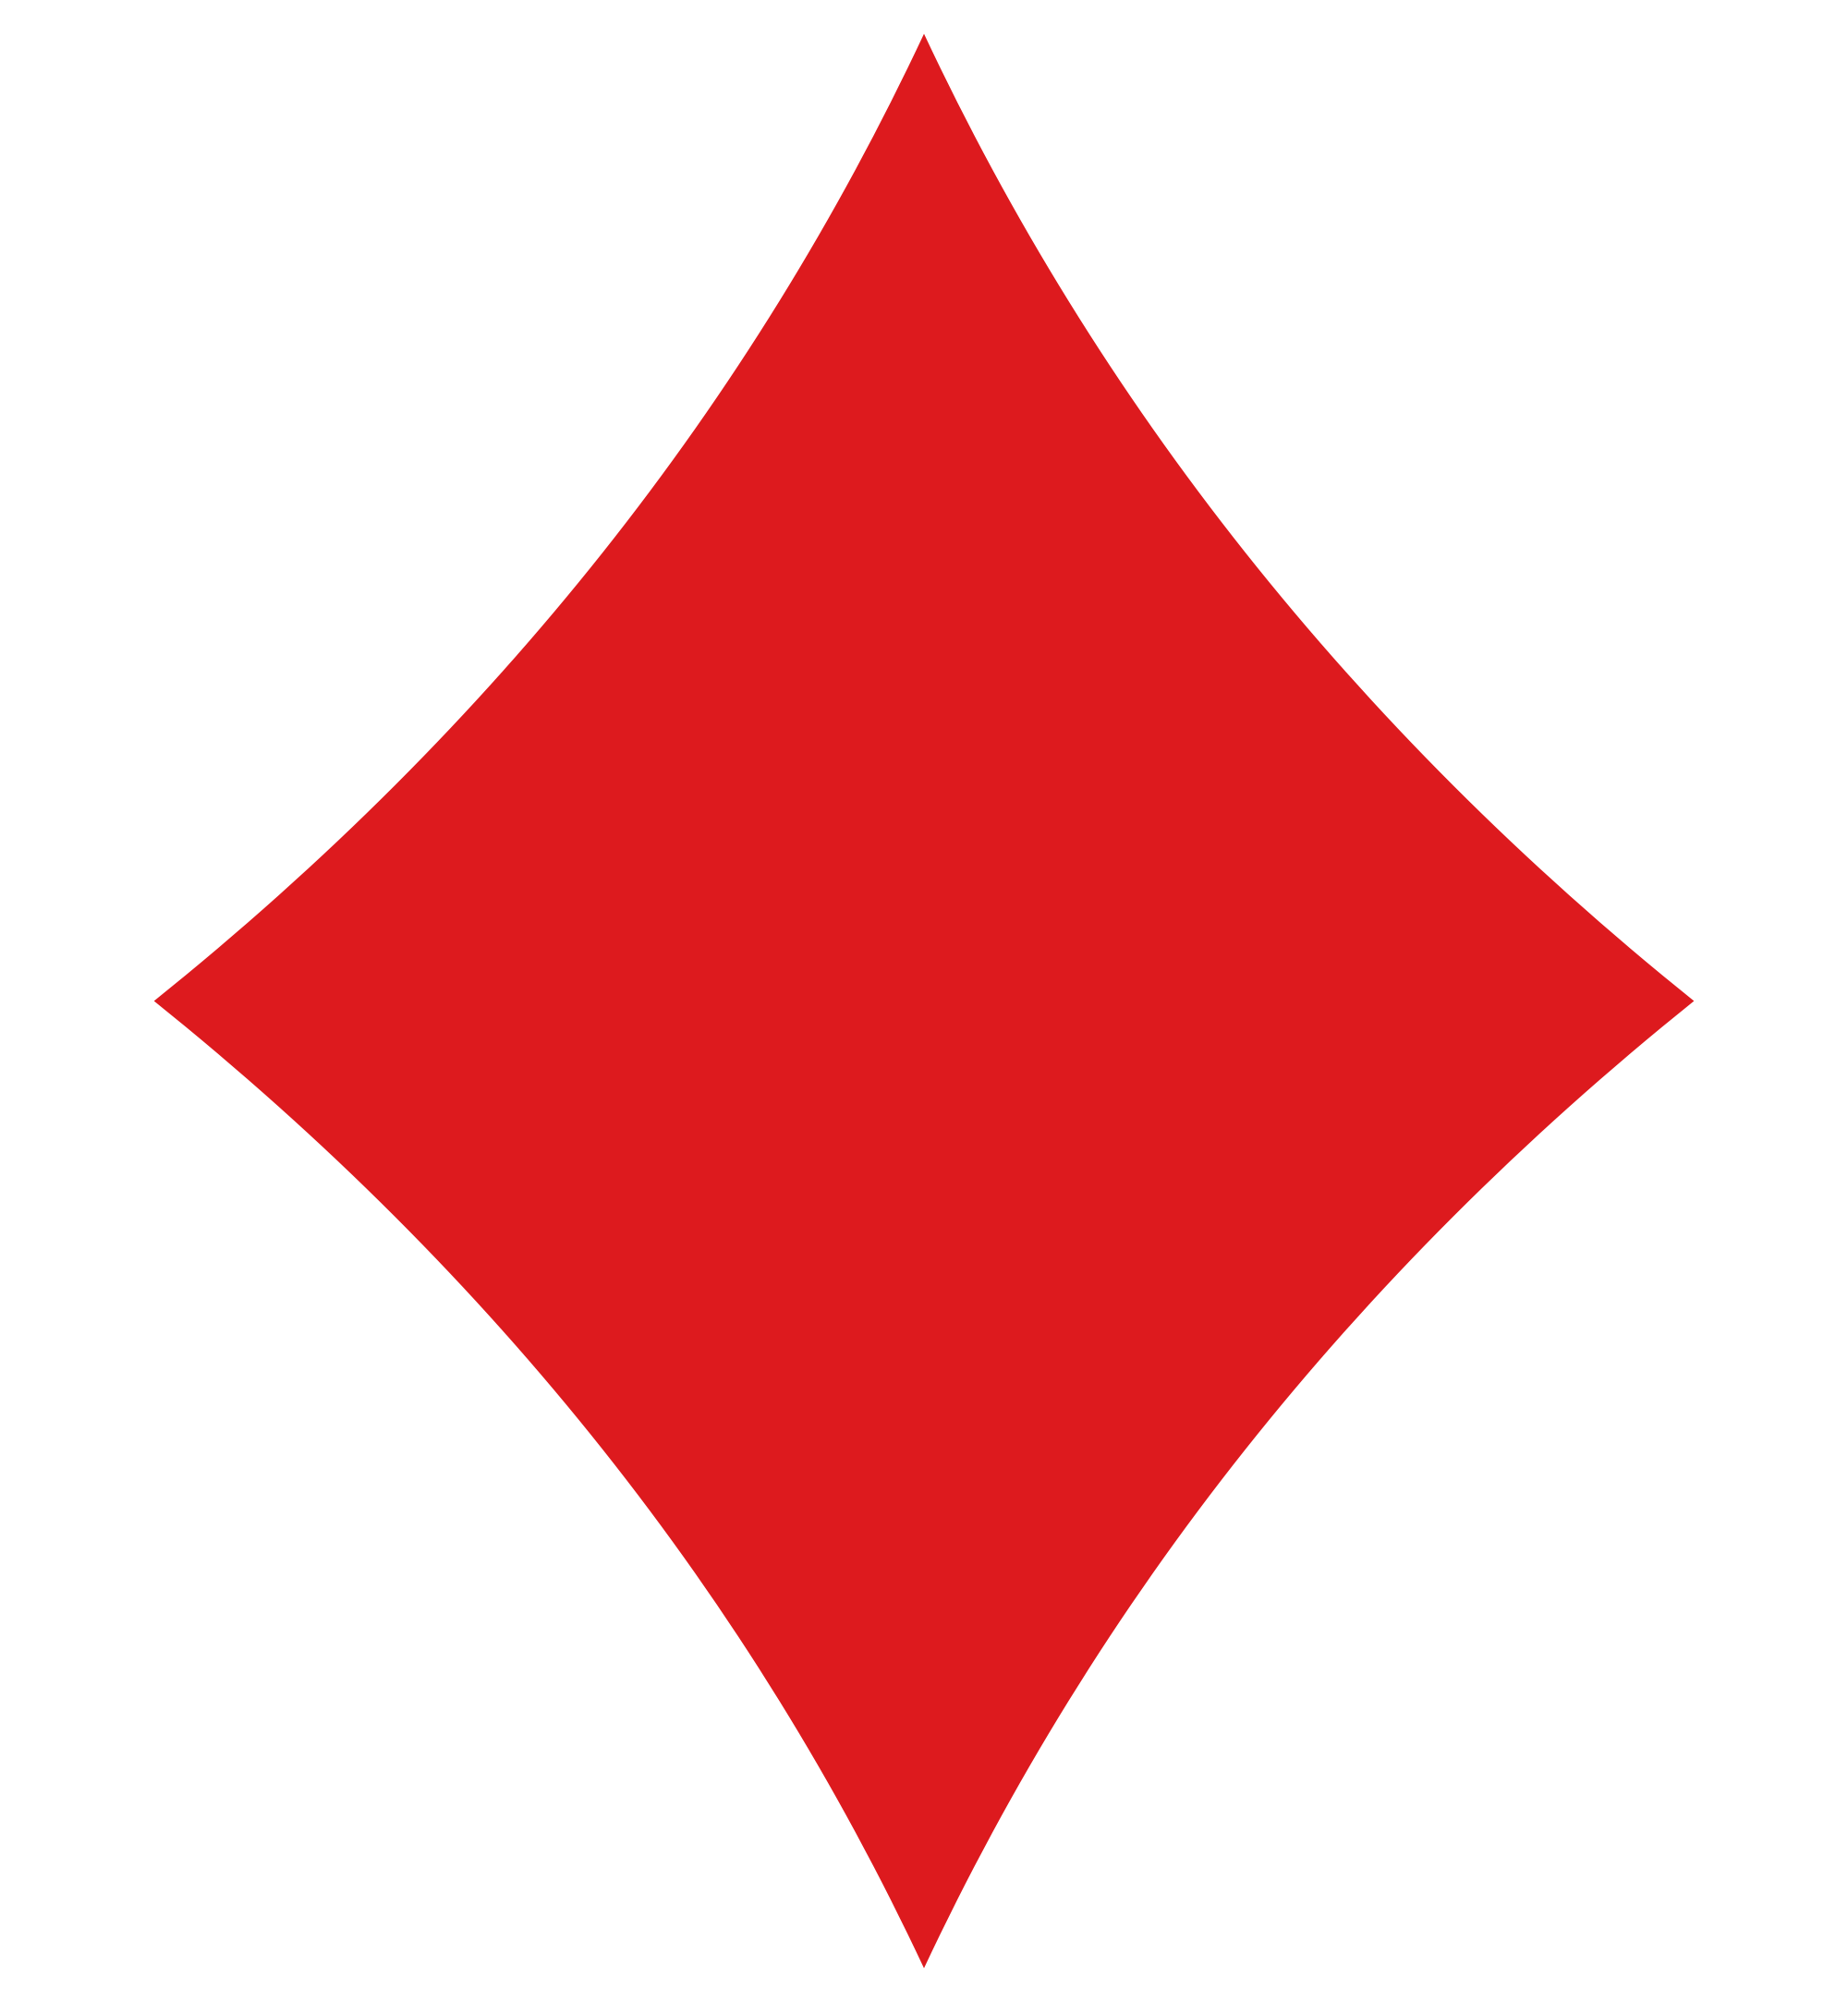 Diamonds clipart red diamond. Karo clip art best